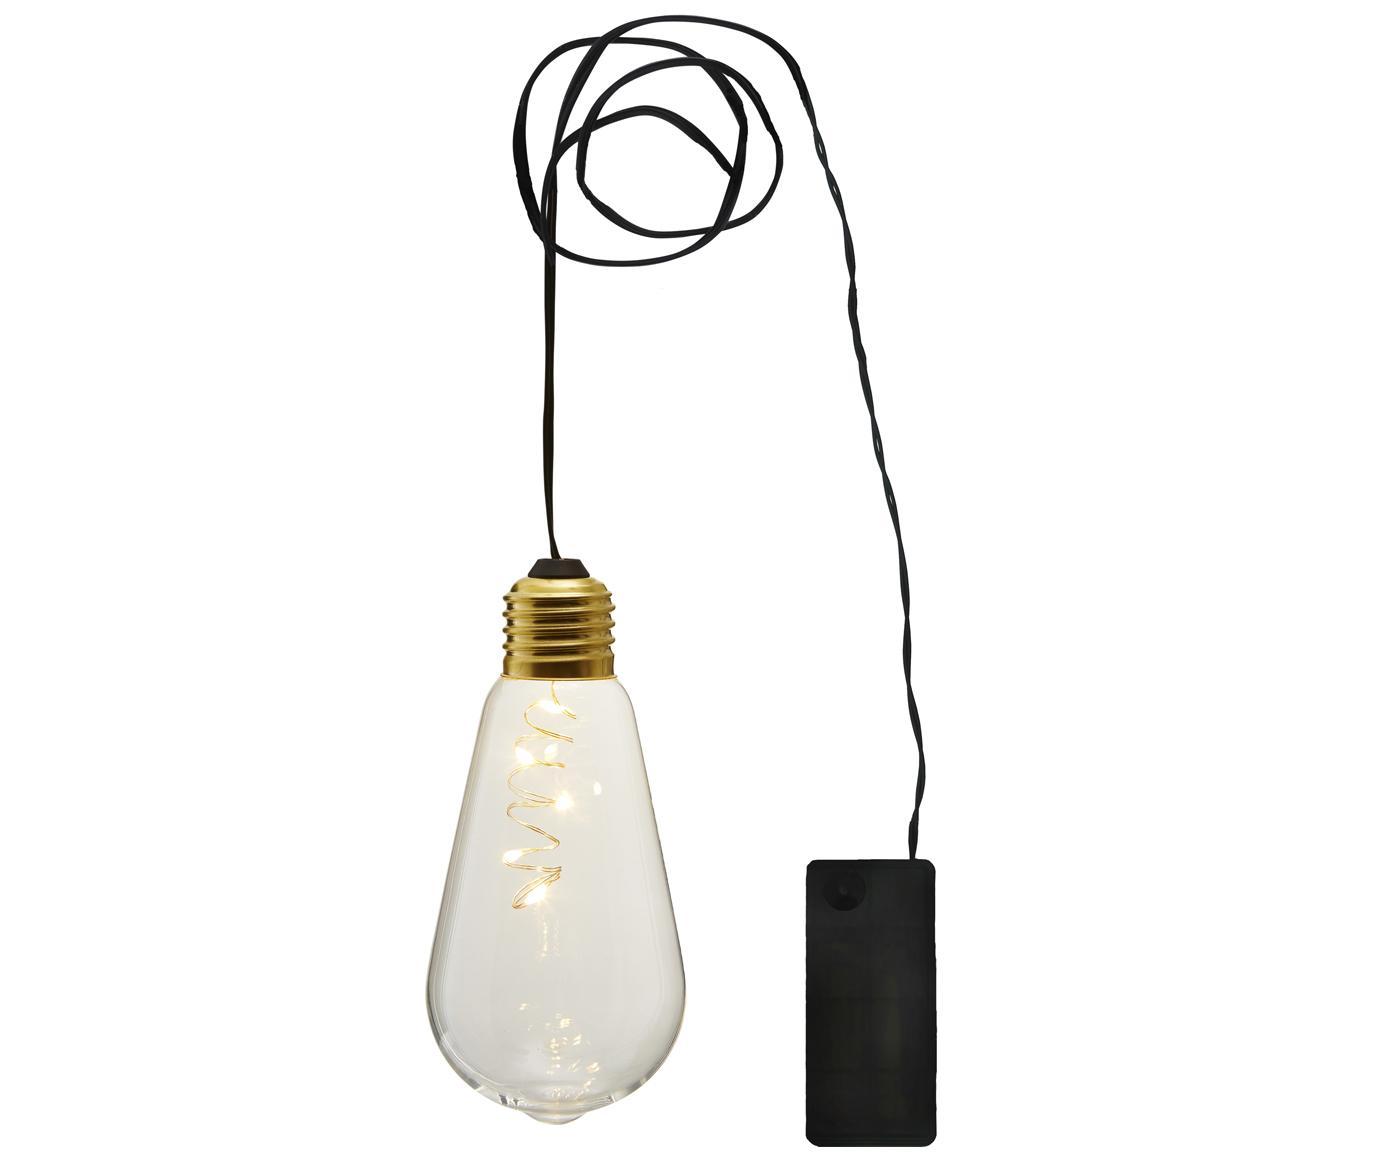 Decoratieve lampen Glow, 2stuks, Lampenkap: glas, Fitting: gecoat metaal, Transparant, Ø 6 x H 13 cm